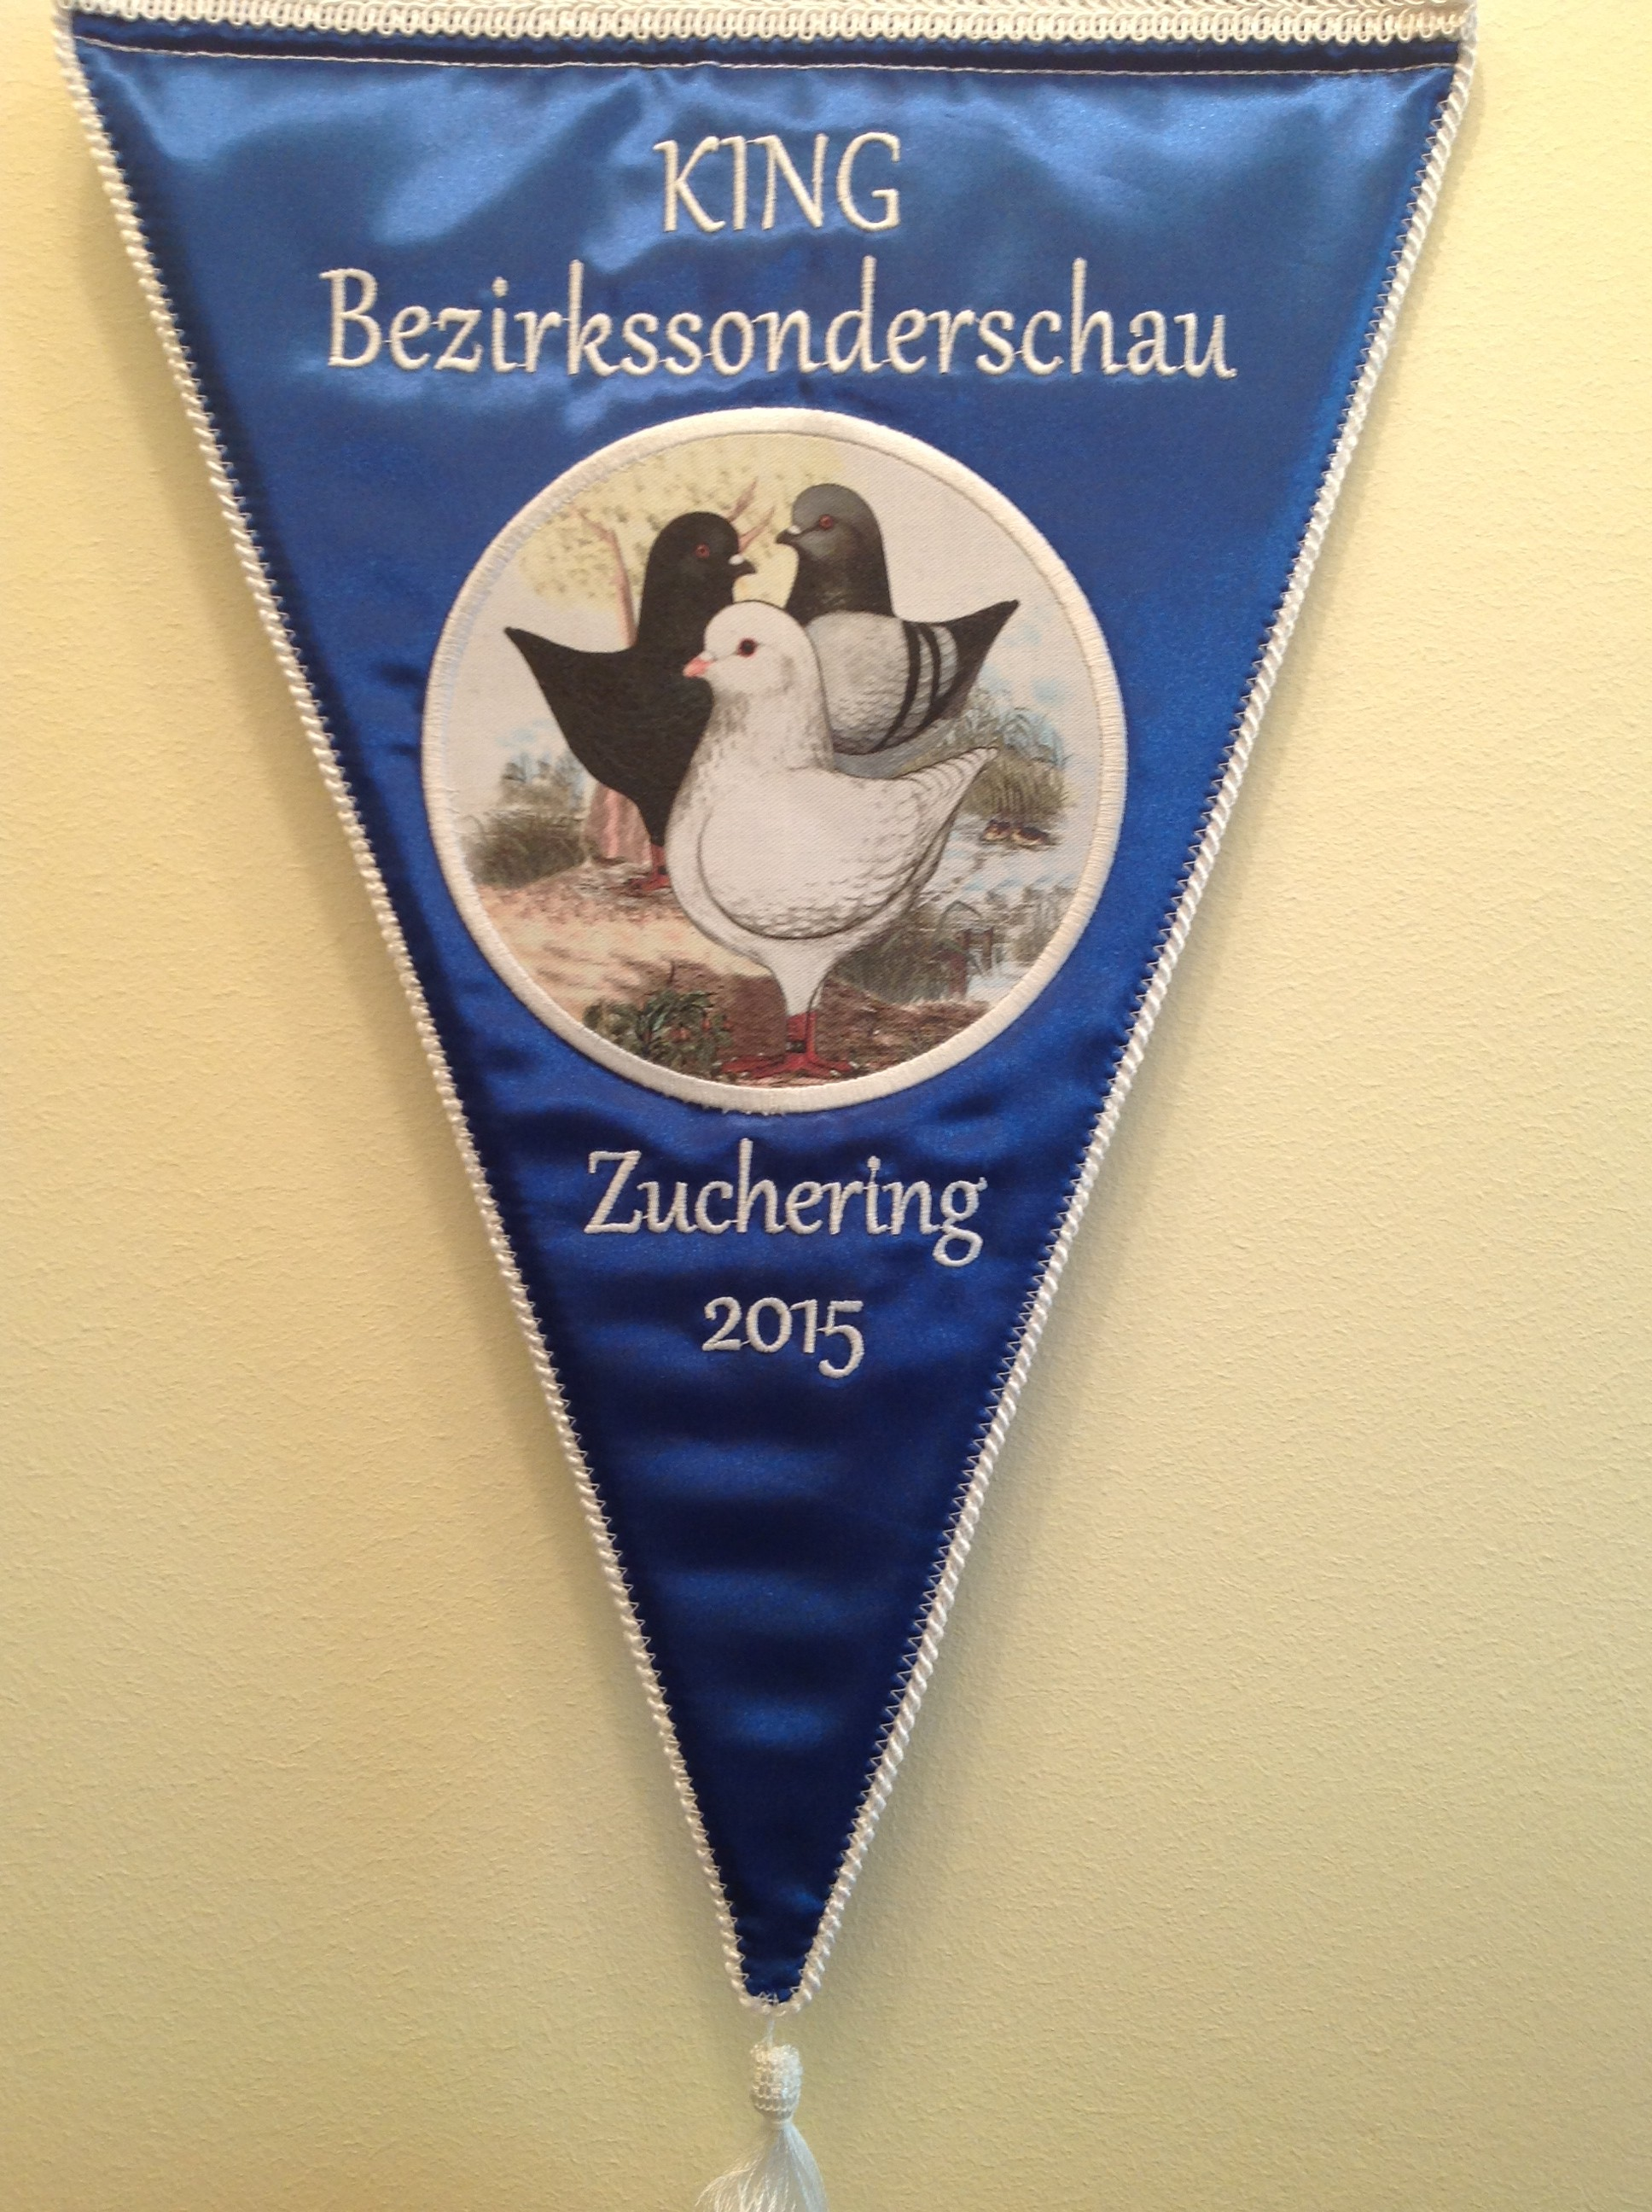 BSS Bez.1 2015 in Zuchering V-Kingwimpel 0.1 Braunfahl